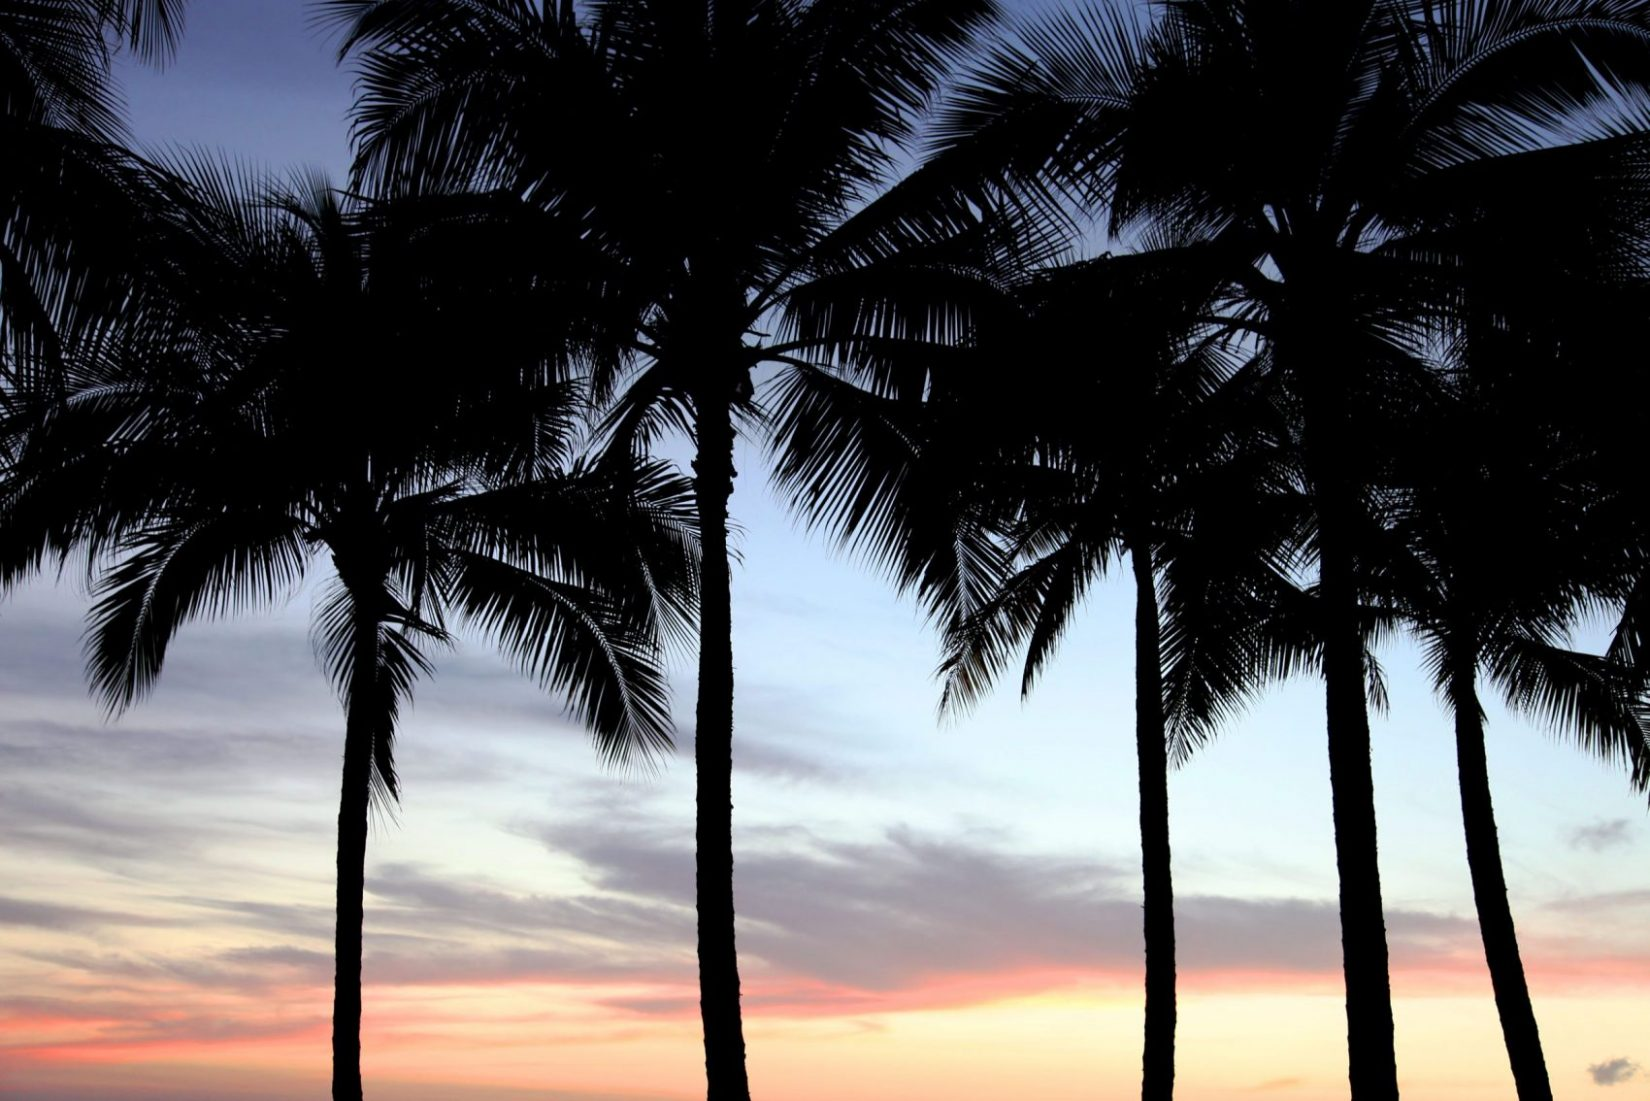 Desktop Background Palm Trees - HD Wallpaper